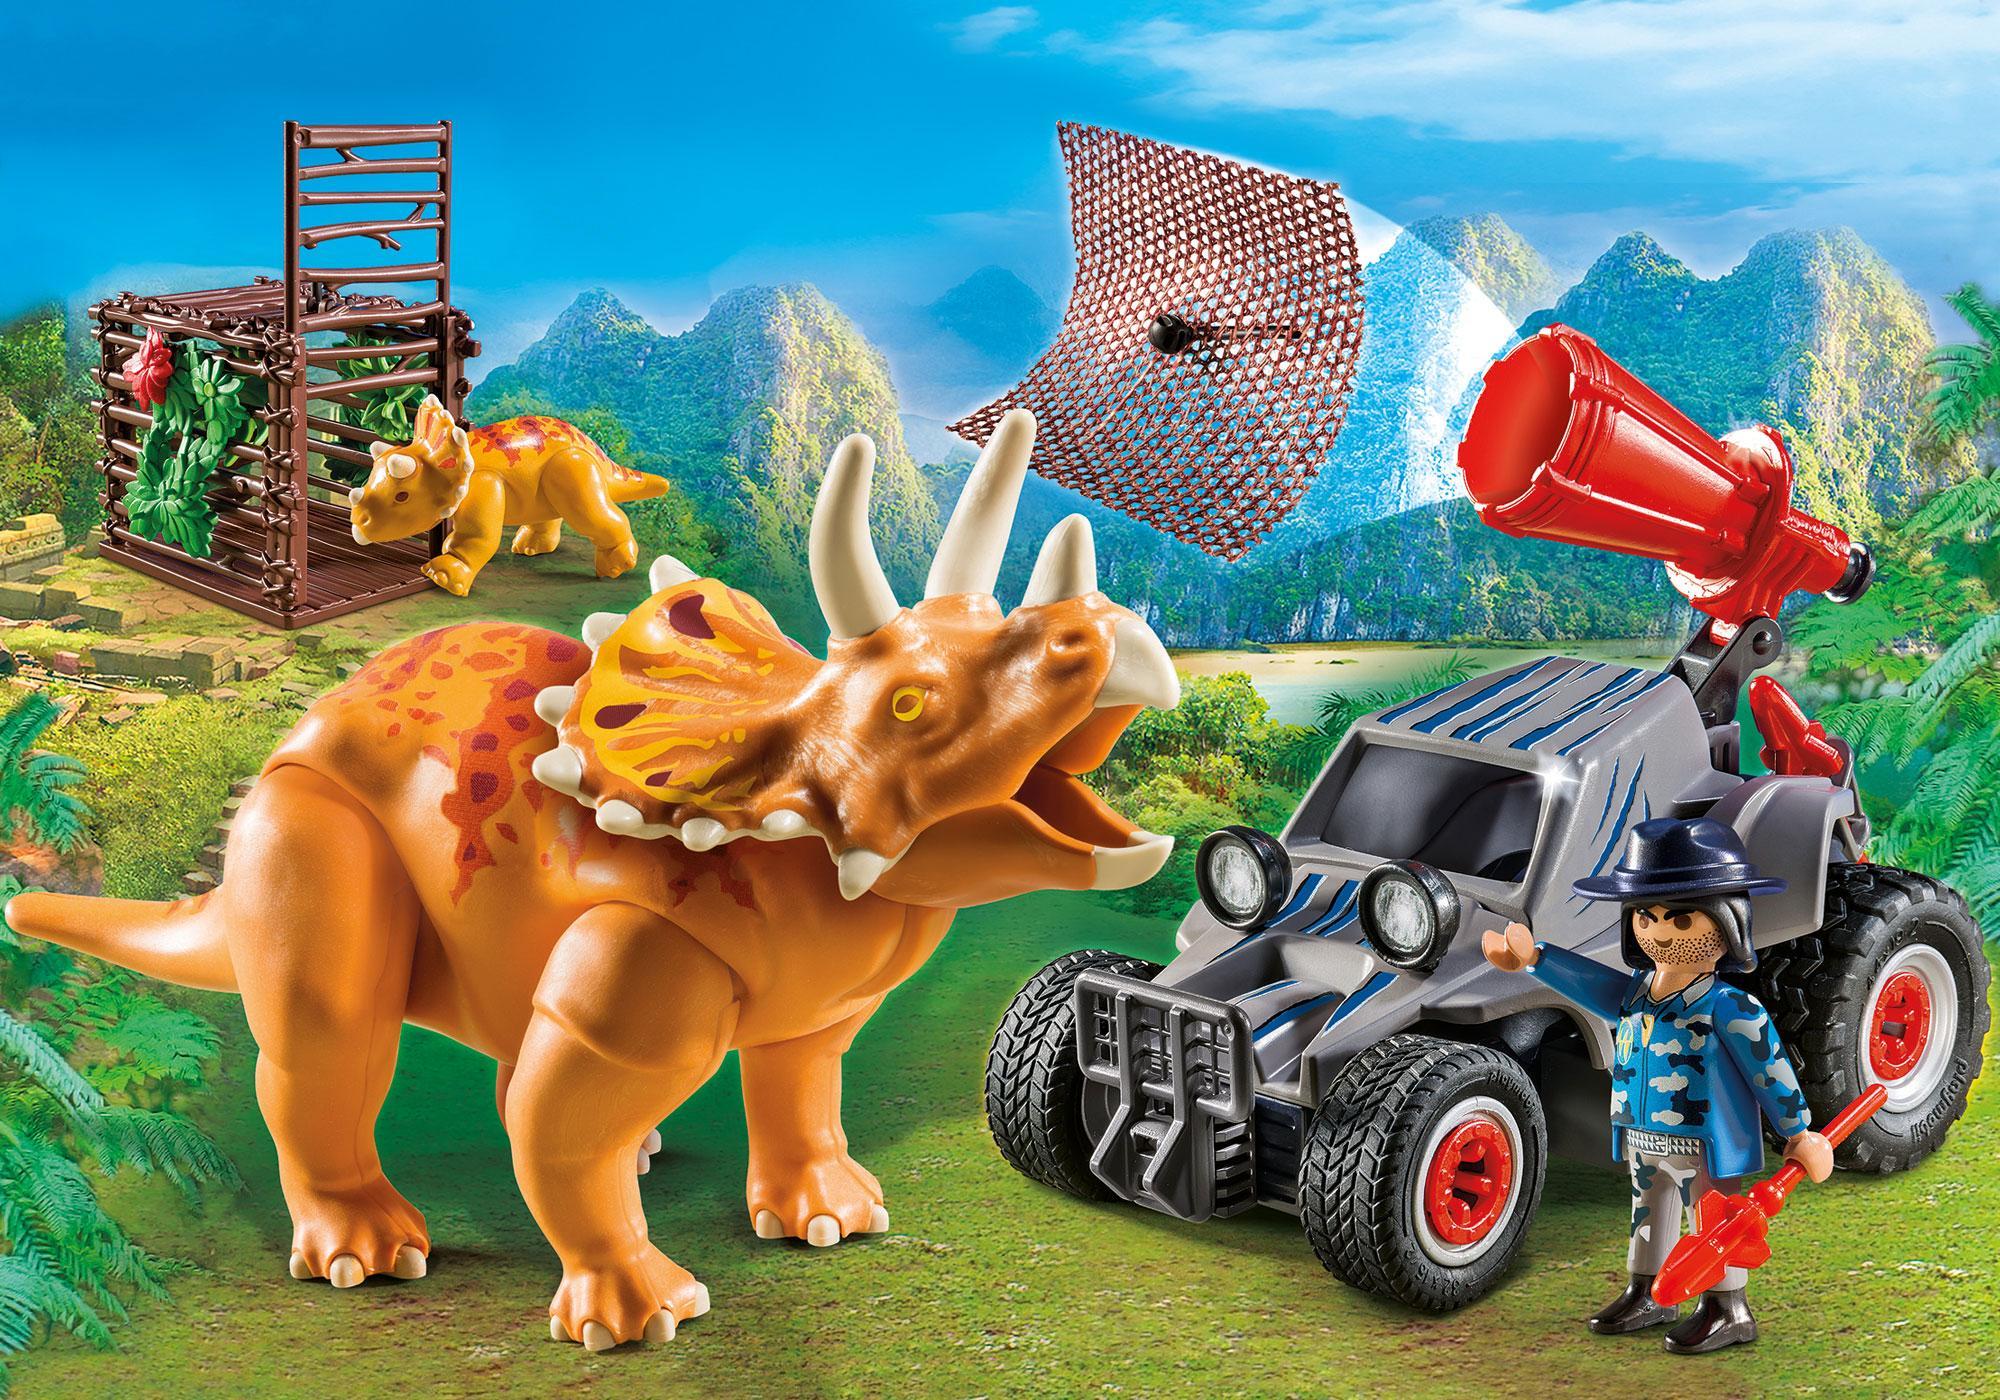 http://media.playmobil.com/i/playmobil/9434_product_detail/Offroader mit Dino-Fangnetz